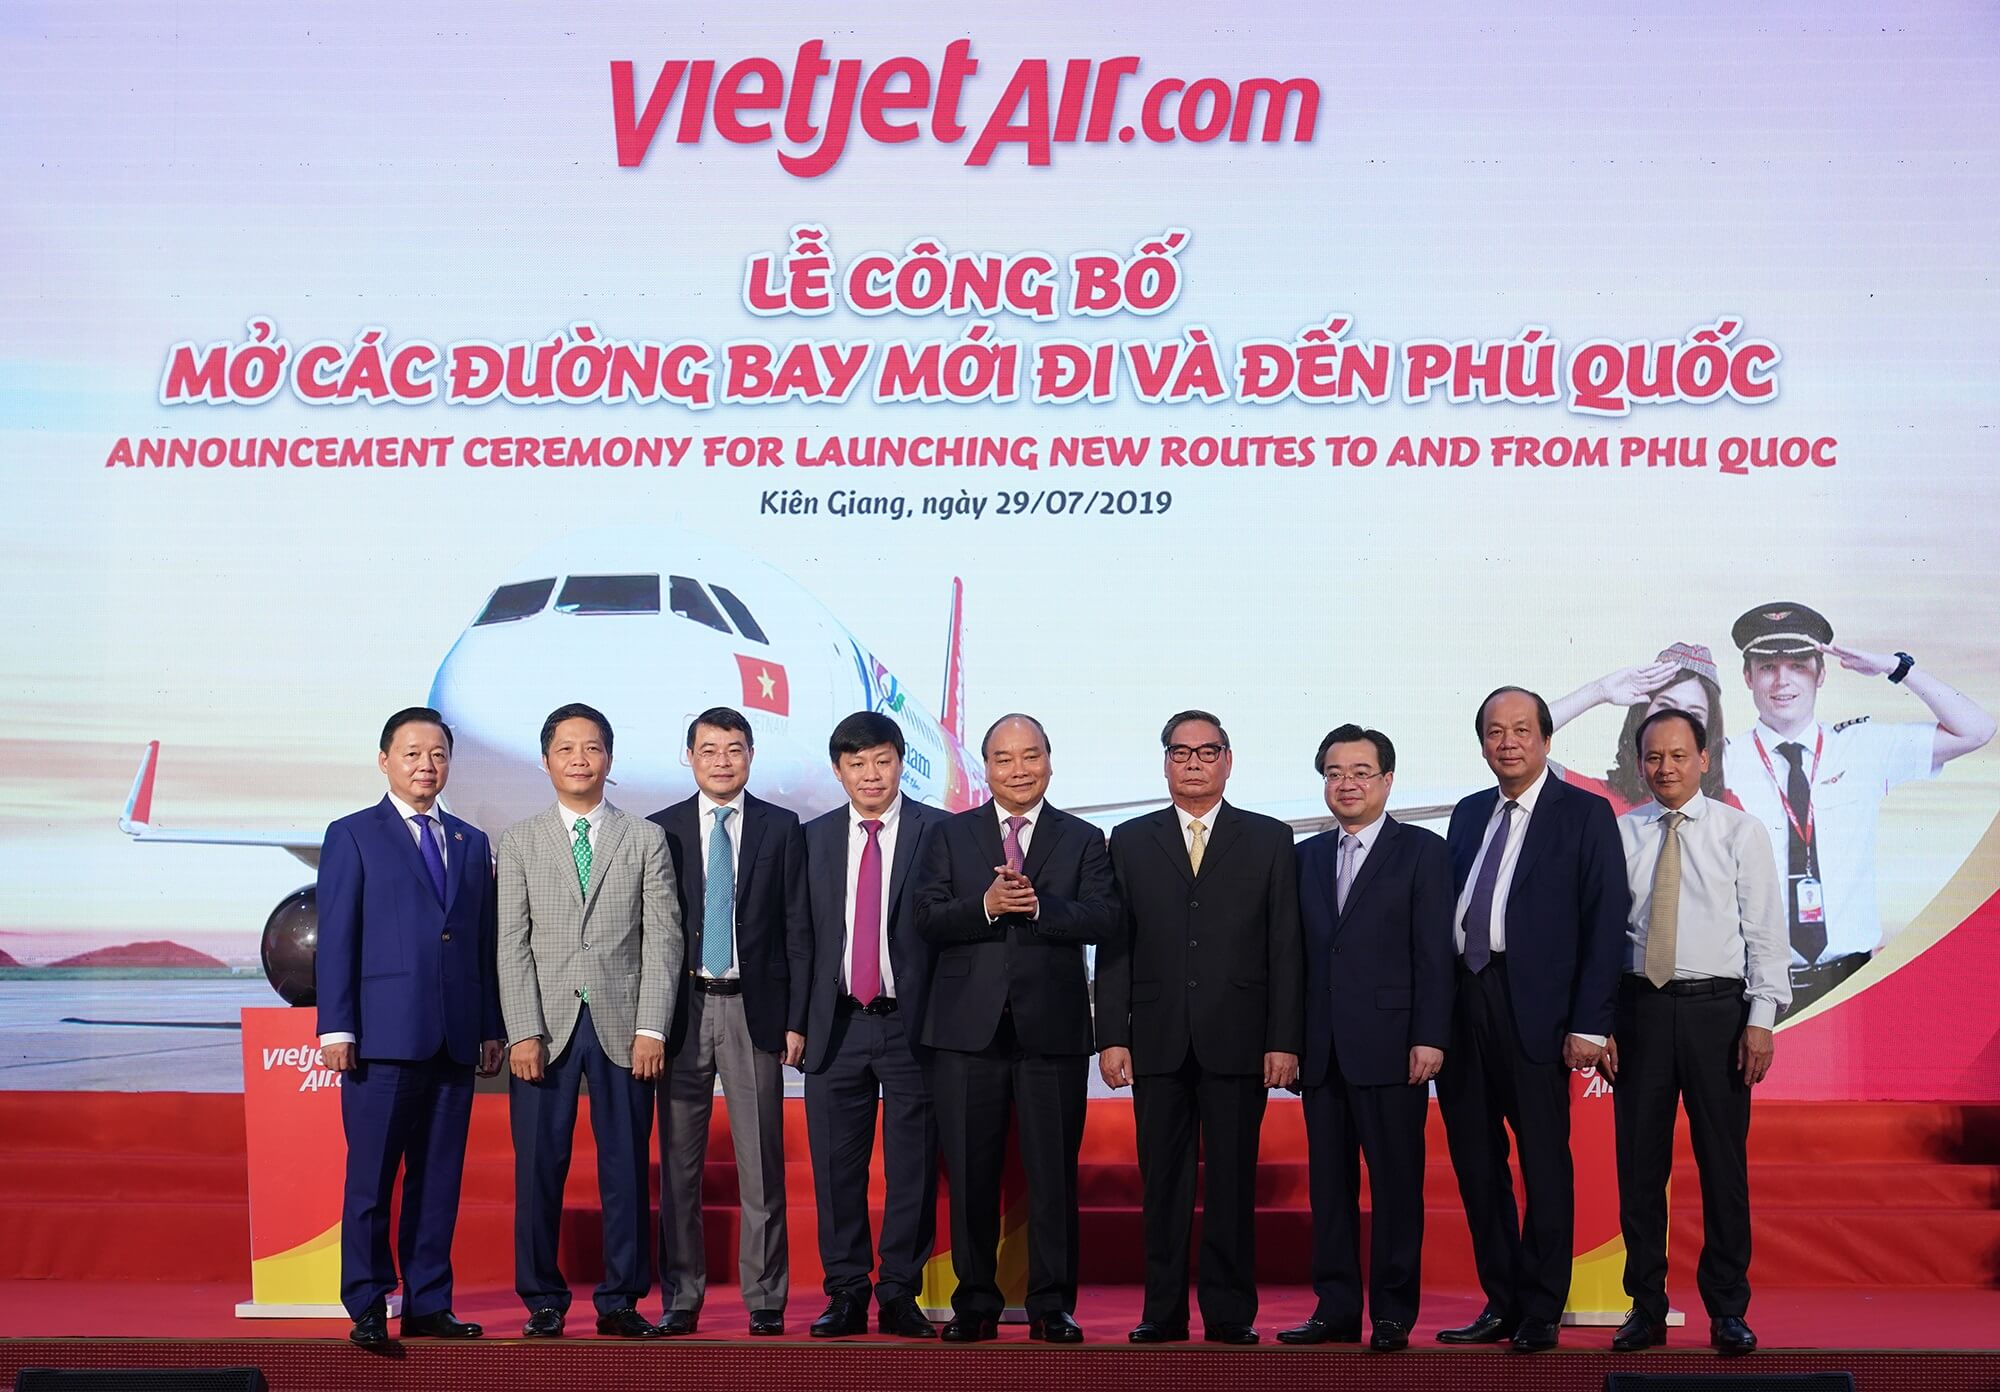 Vietjet meningkatkan frekuensi penerbangan ke pulau Phu Quoc